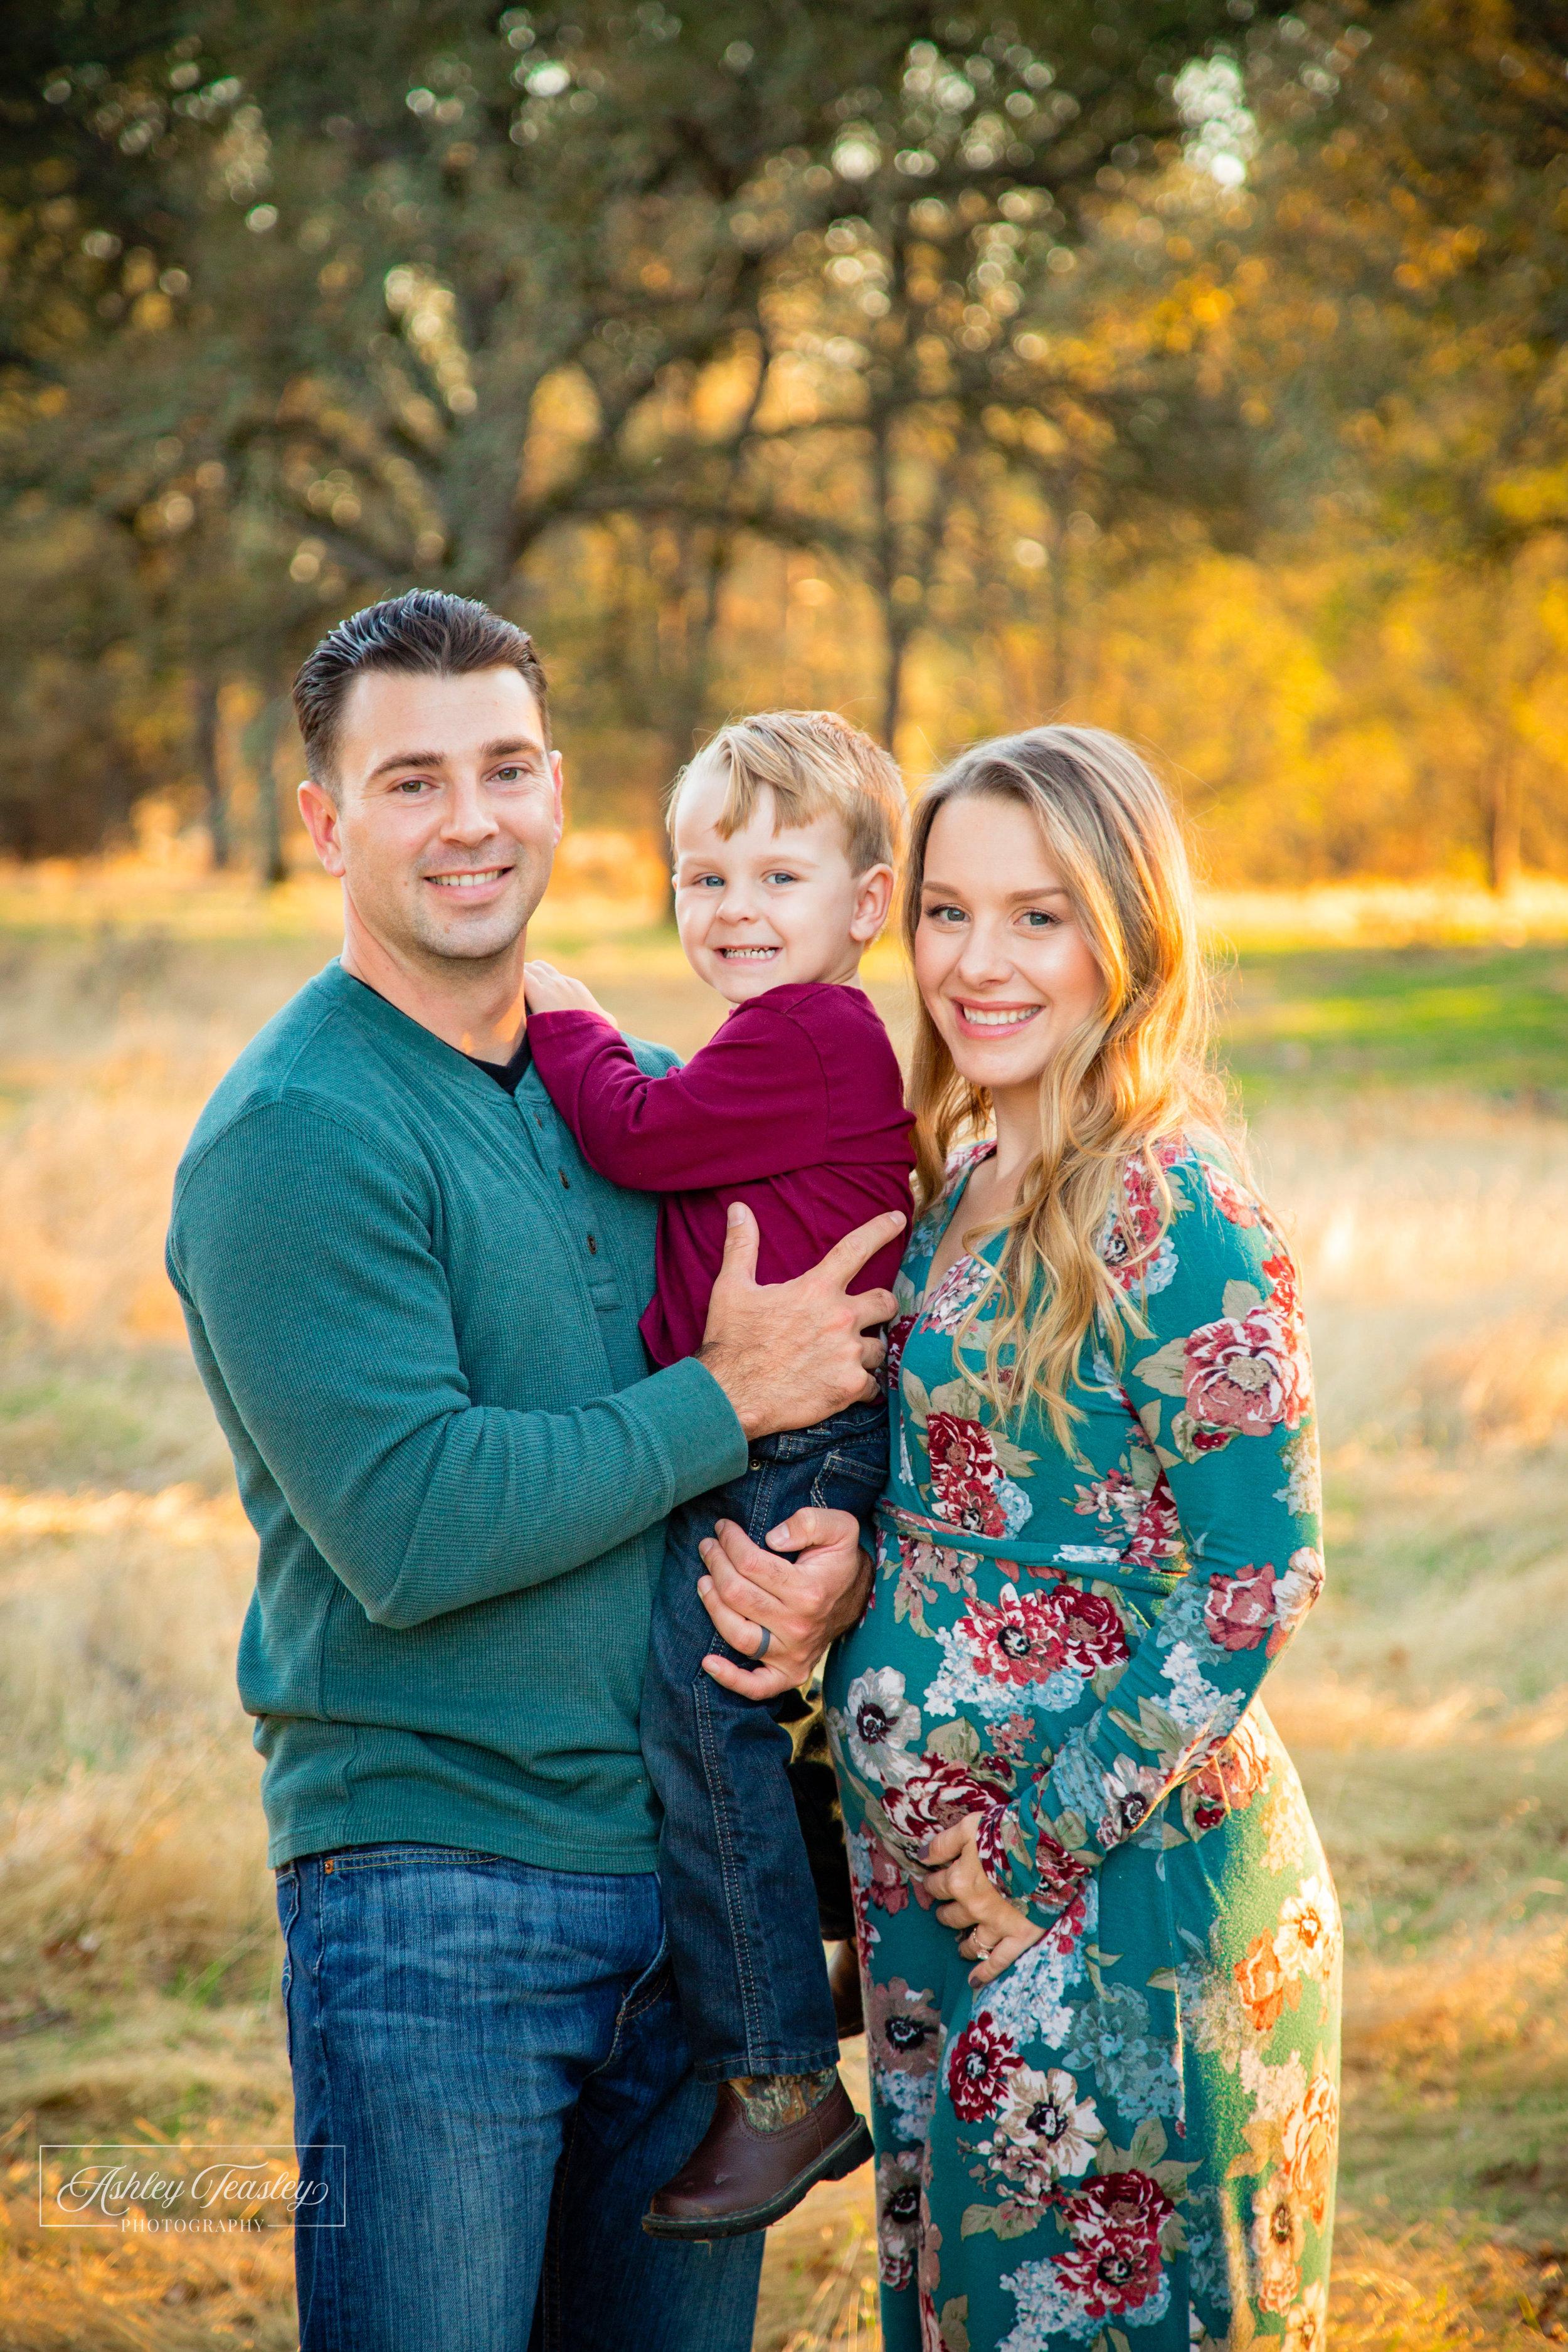 Family Session - Maternity Session - Sacramento Wedding Photographer - Ashley Teasley Photography-10.jpg